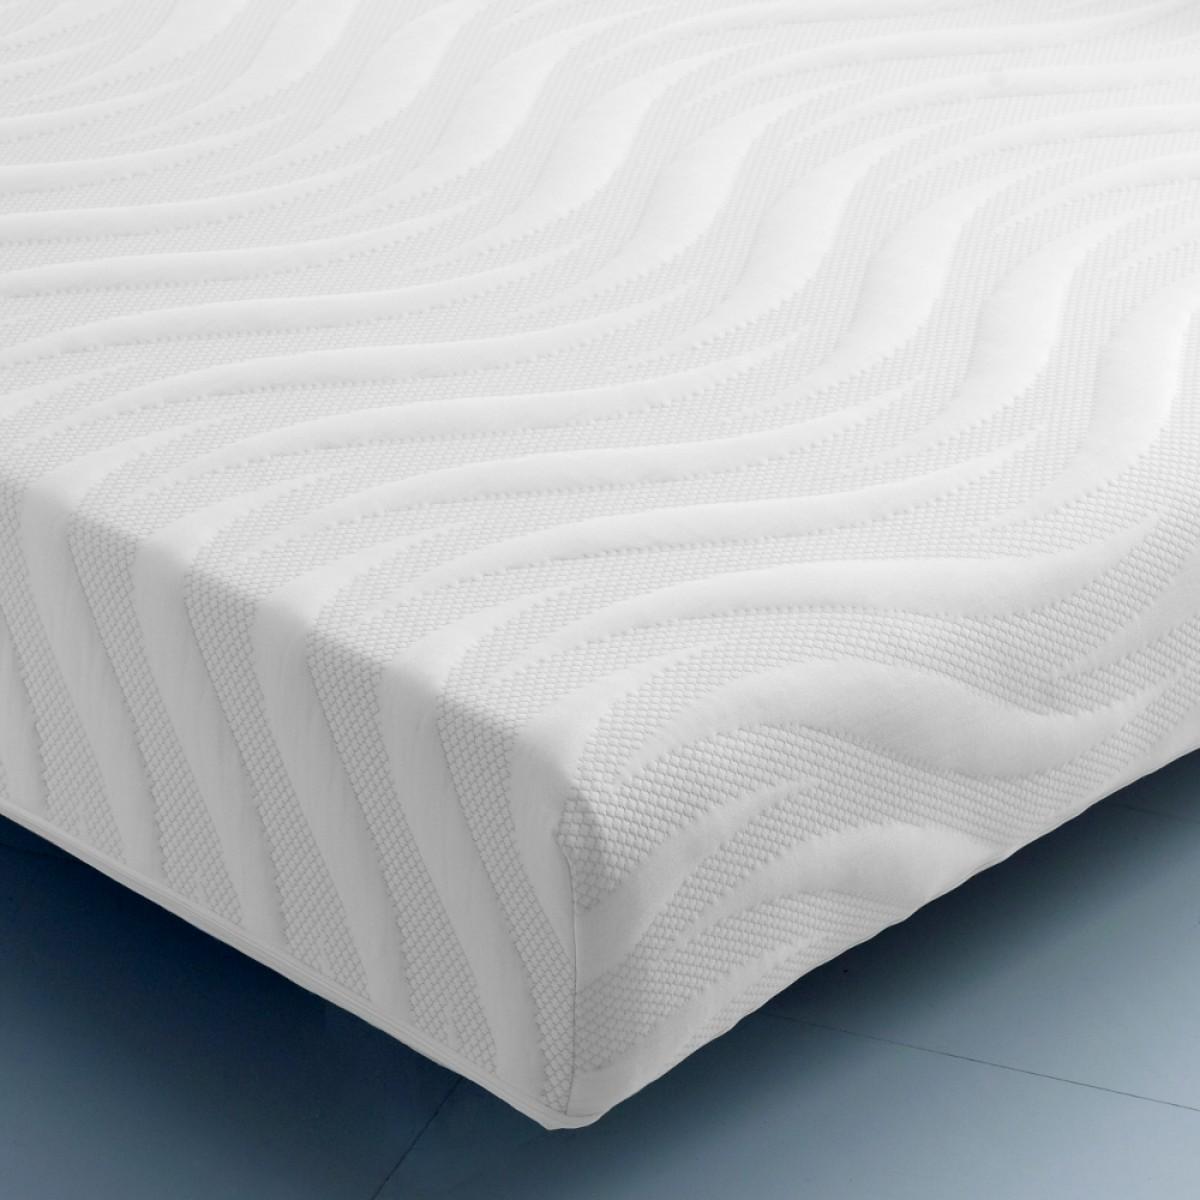 Ocean Gel Pocket 2000 Memory and Reflex Foam Individual Sprung Cool Orthopaedic LayGel Mattress